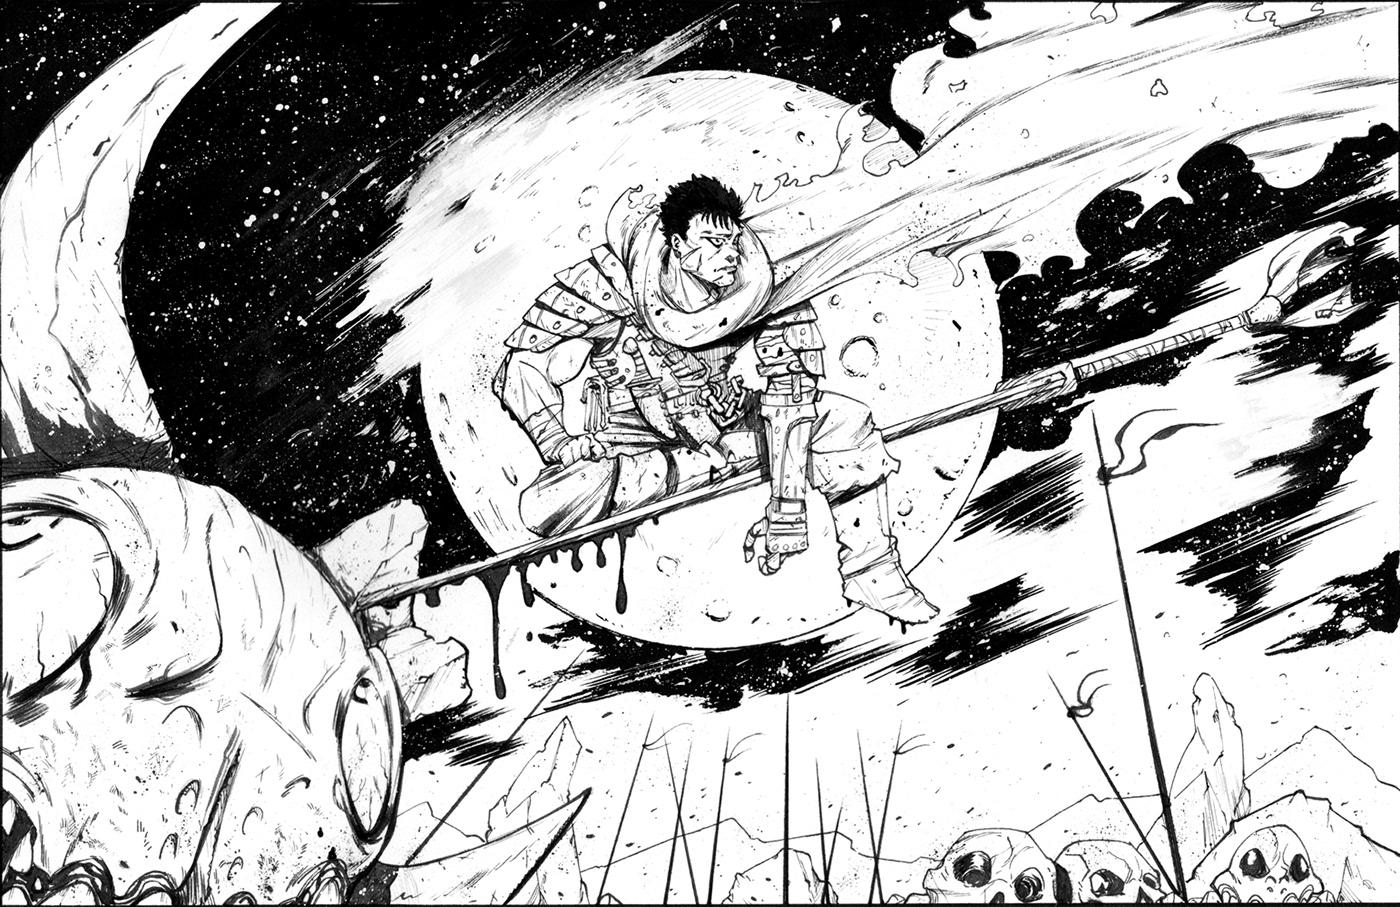 anime comics Dragonball Drawing  godzilla ink manga marvel comics star  wars Xmen